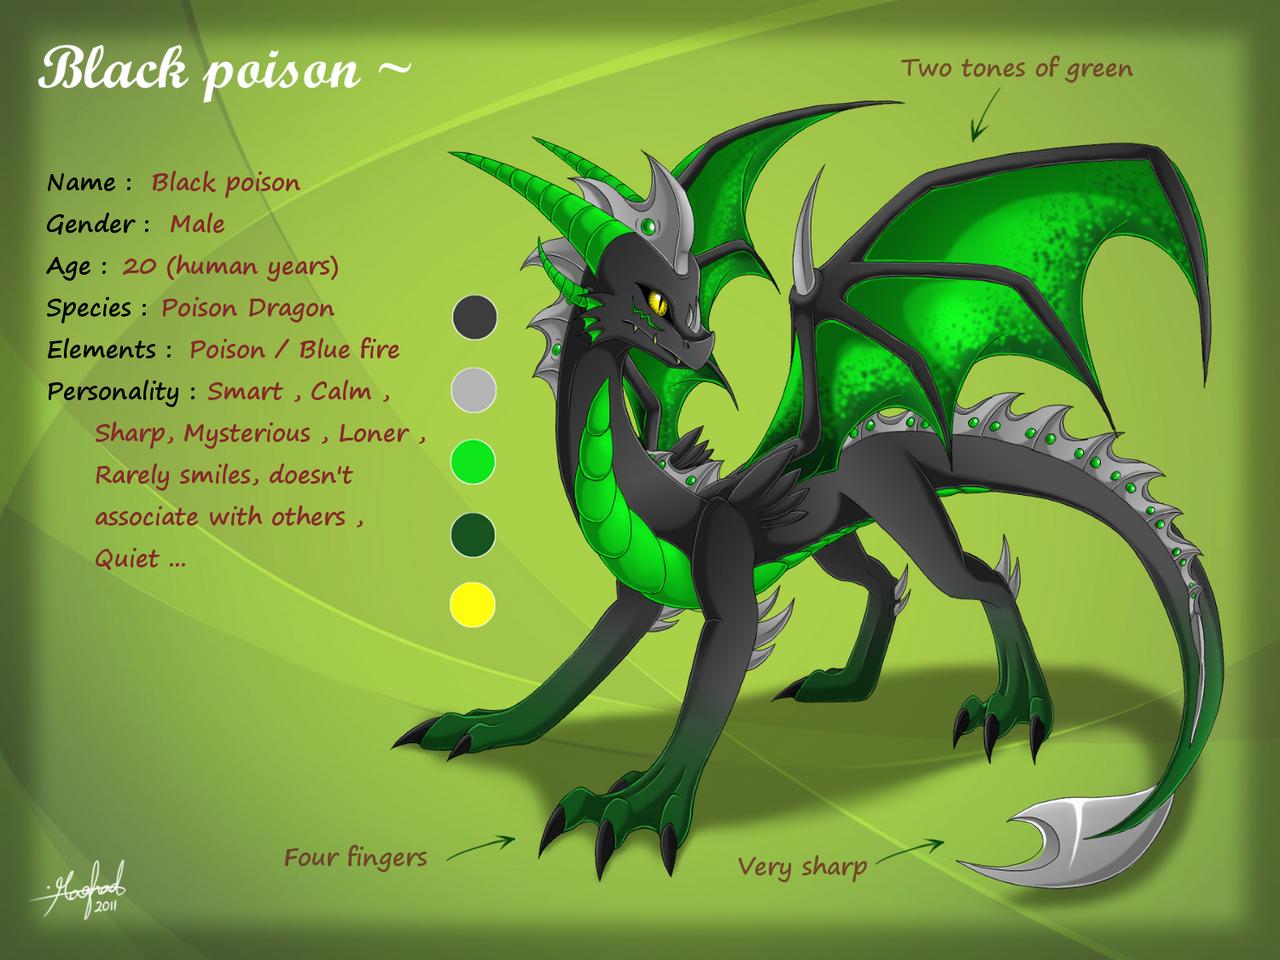 Black poison ref sheet by Rorita-Sakura on DeviantArt